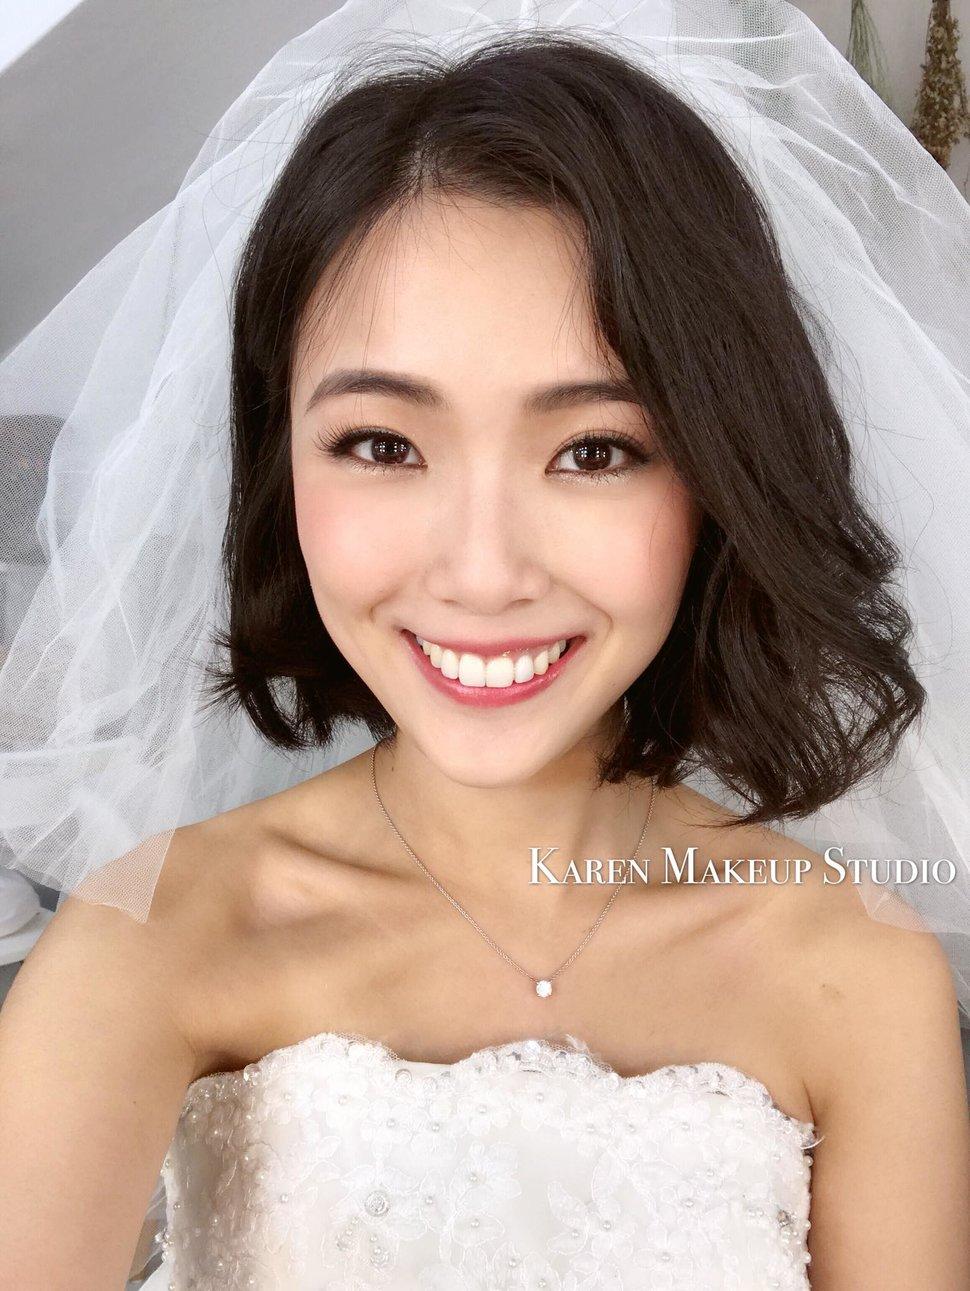 38227565_2178624858832031_5719378025598943232_o - KarenMakeup新娘秘書/韓系造型《結婚吧》